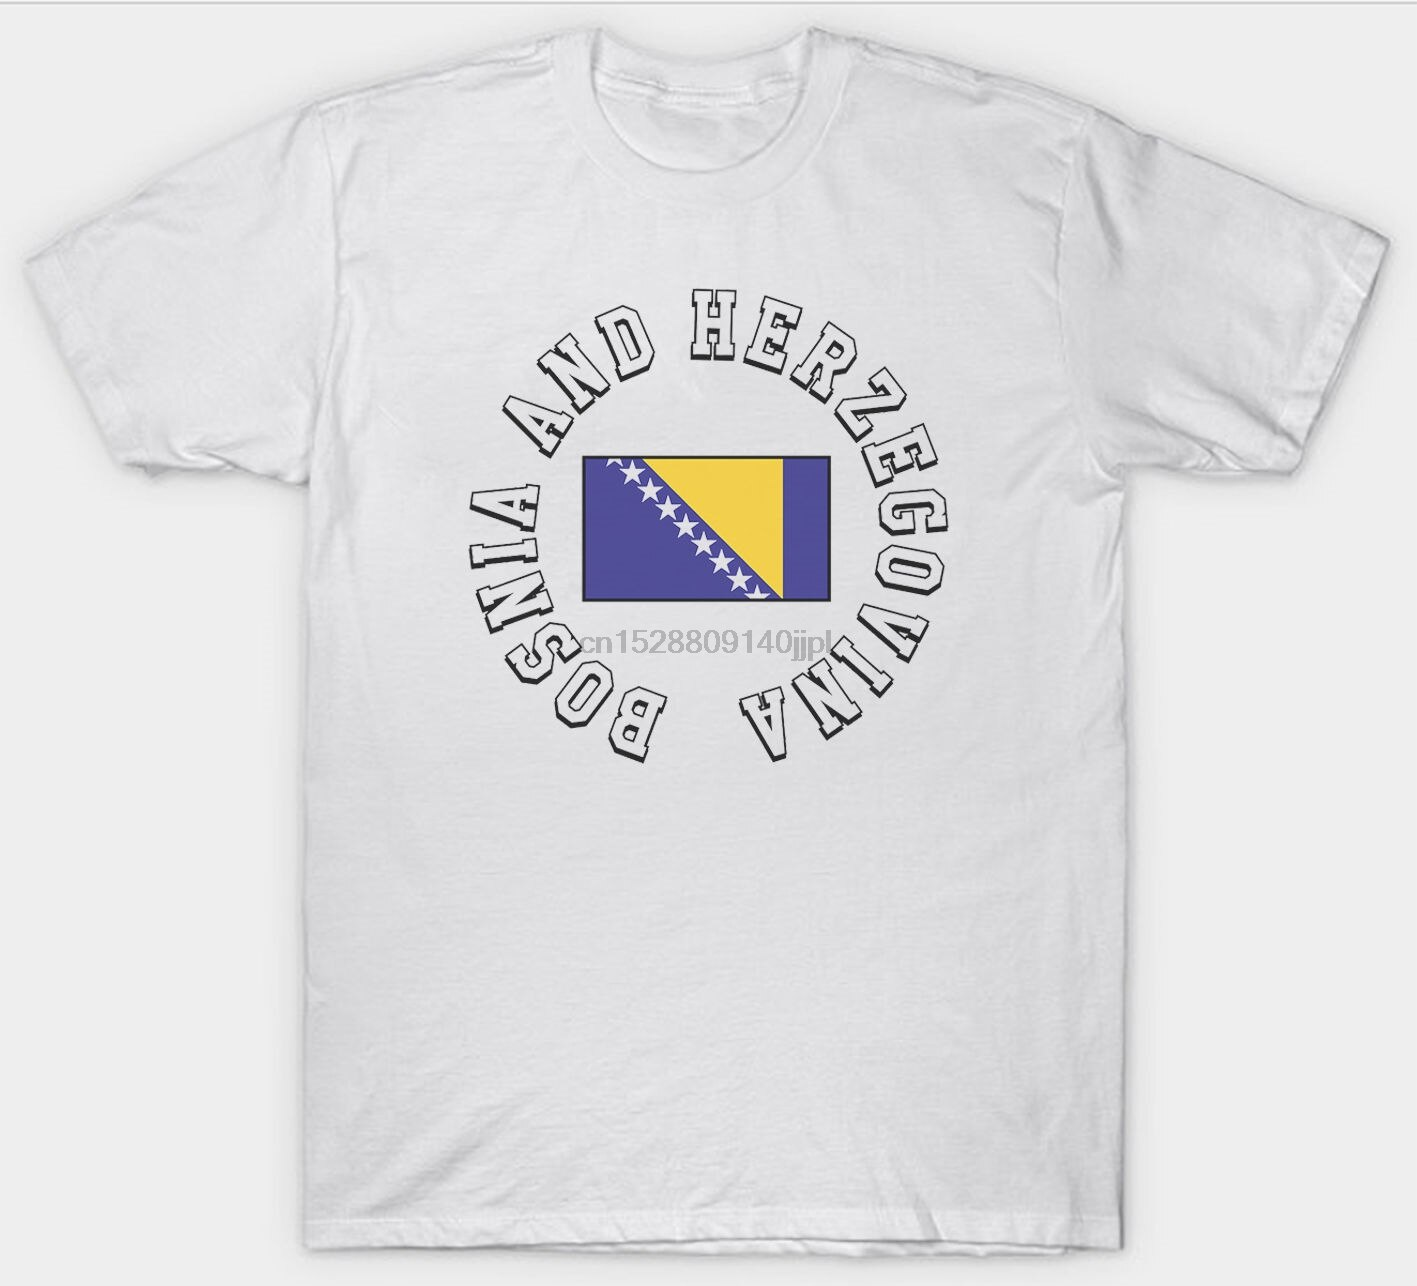 Bandera de BOSNIA Herzegovina T camisa UE país de Europa serbio SERBIA superior envío gratis camiseta